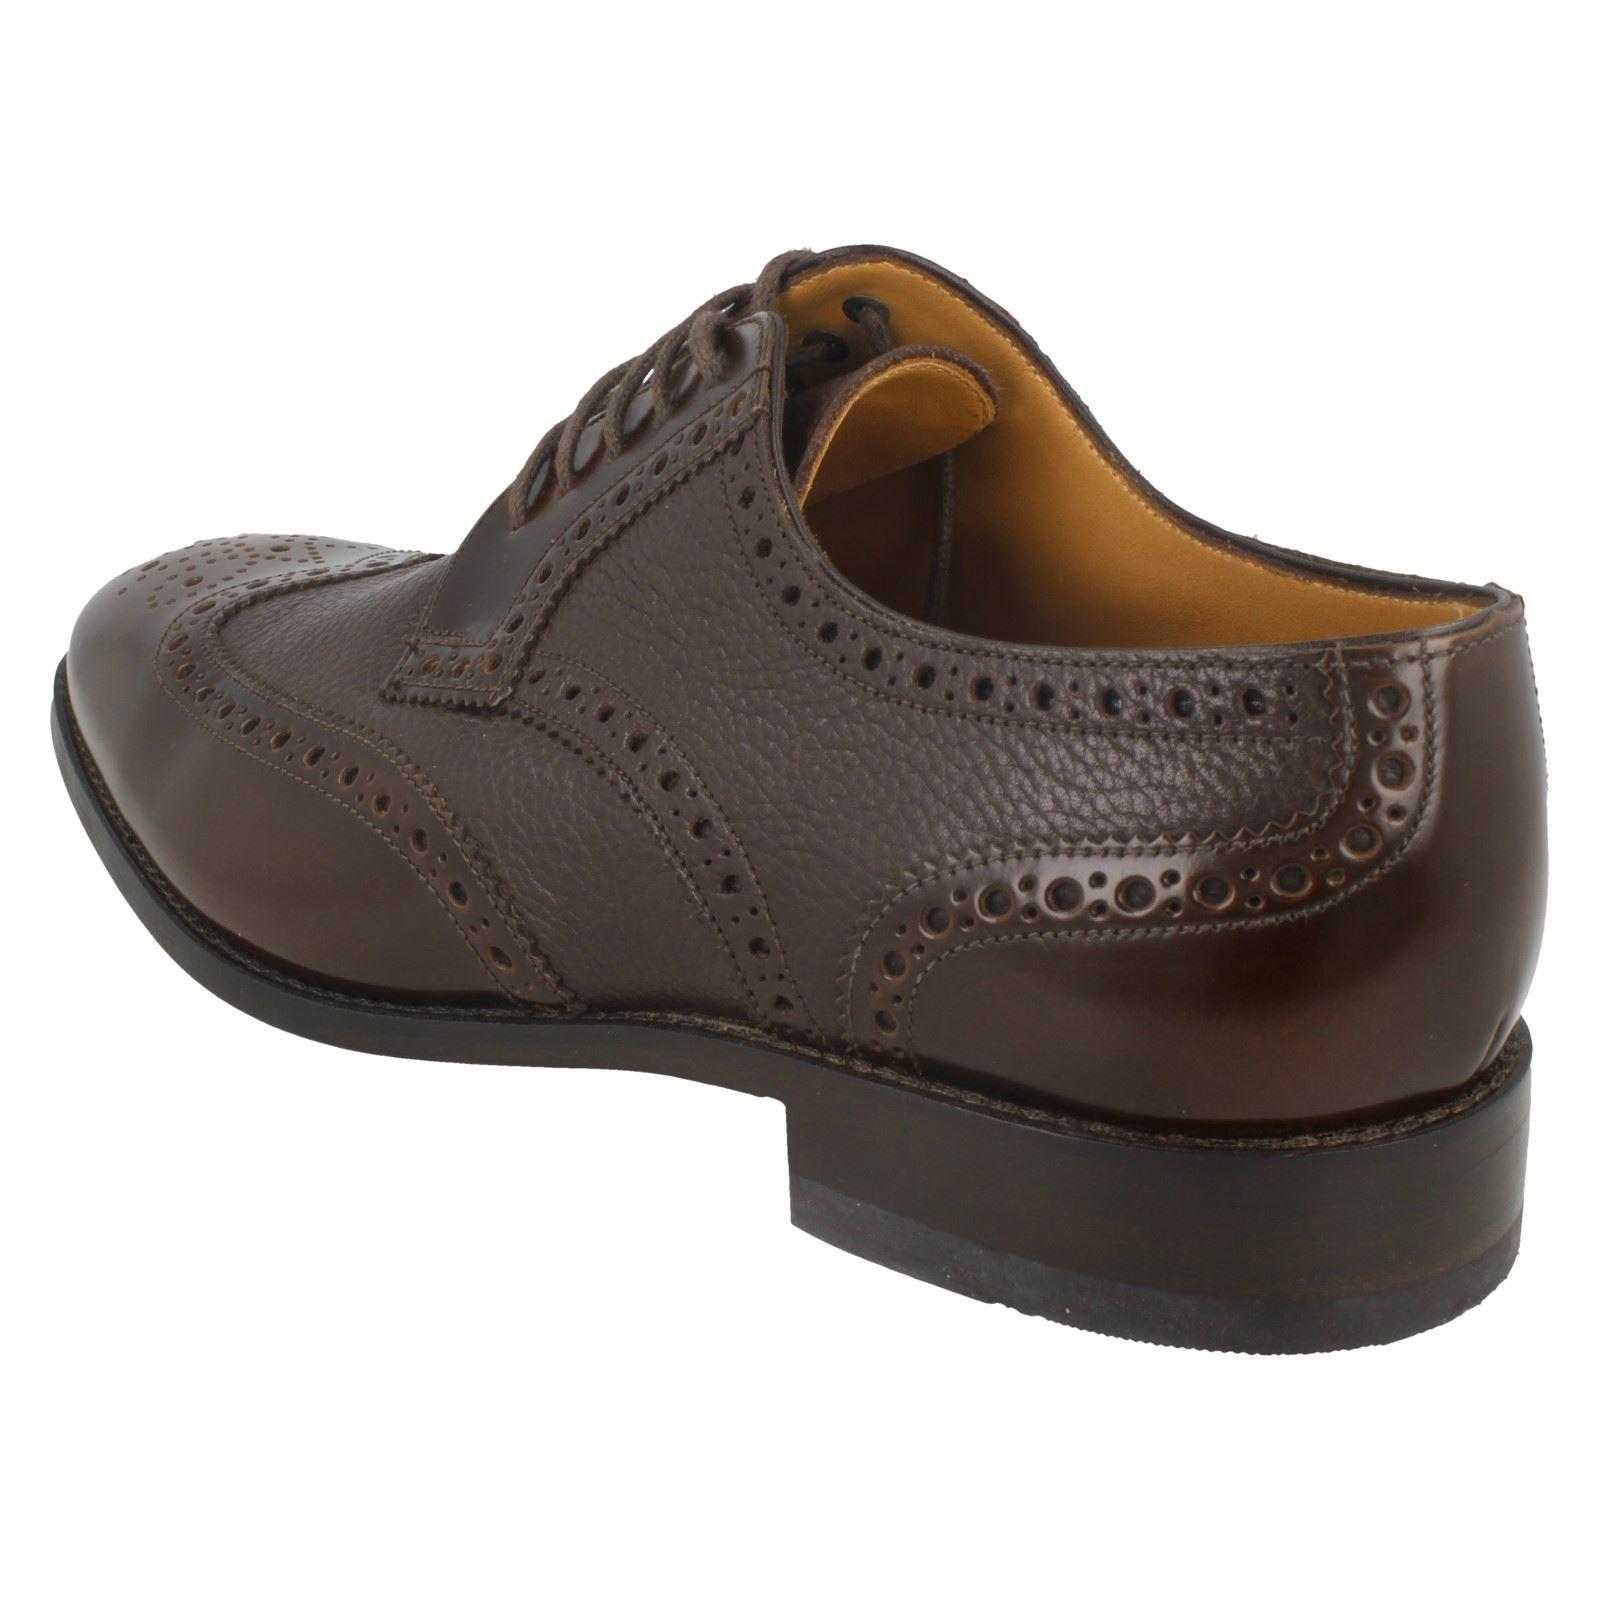 Herren Loake Brogue Schuhes Arlington 7c1b1e